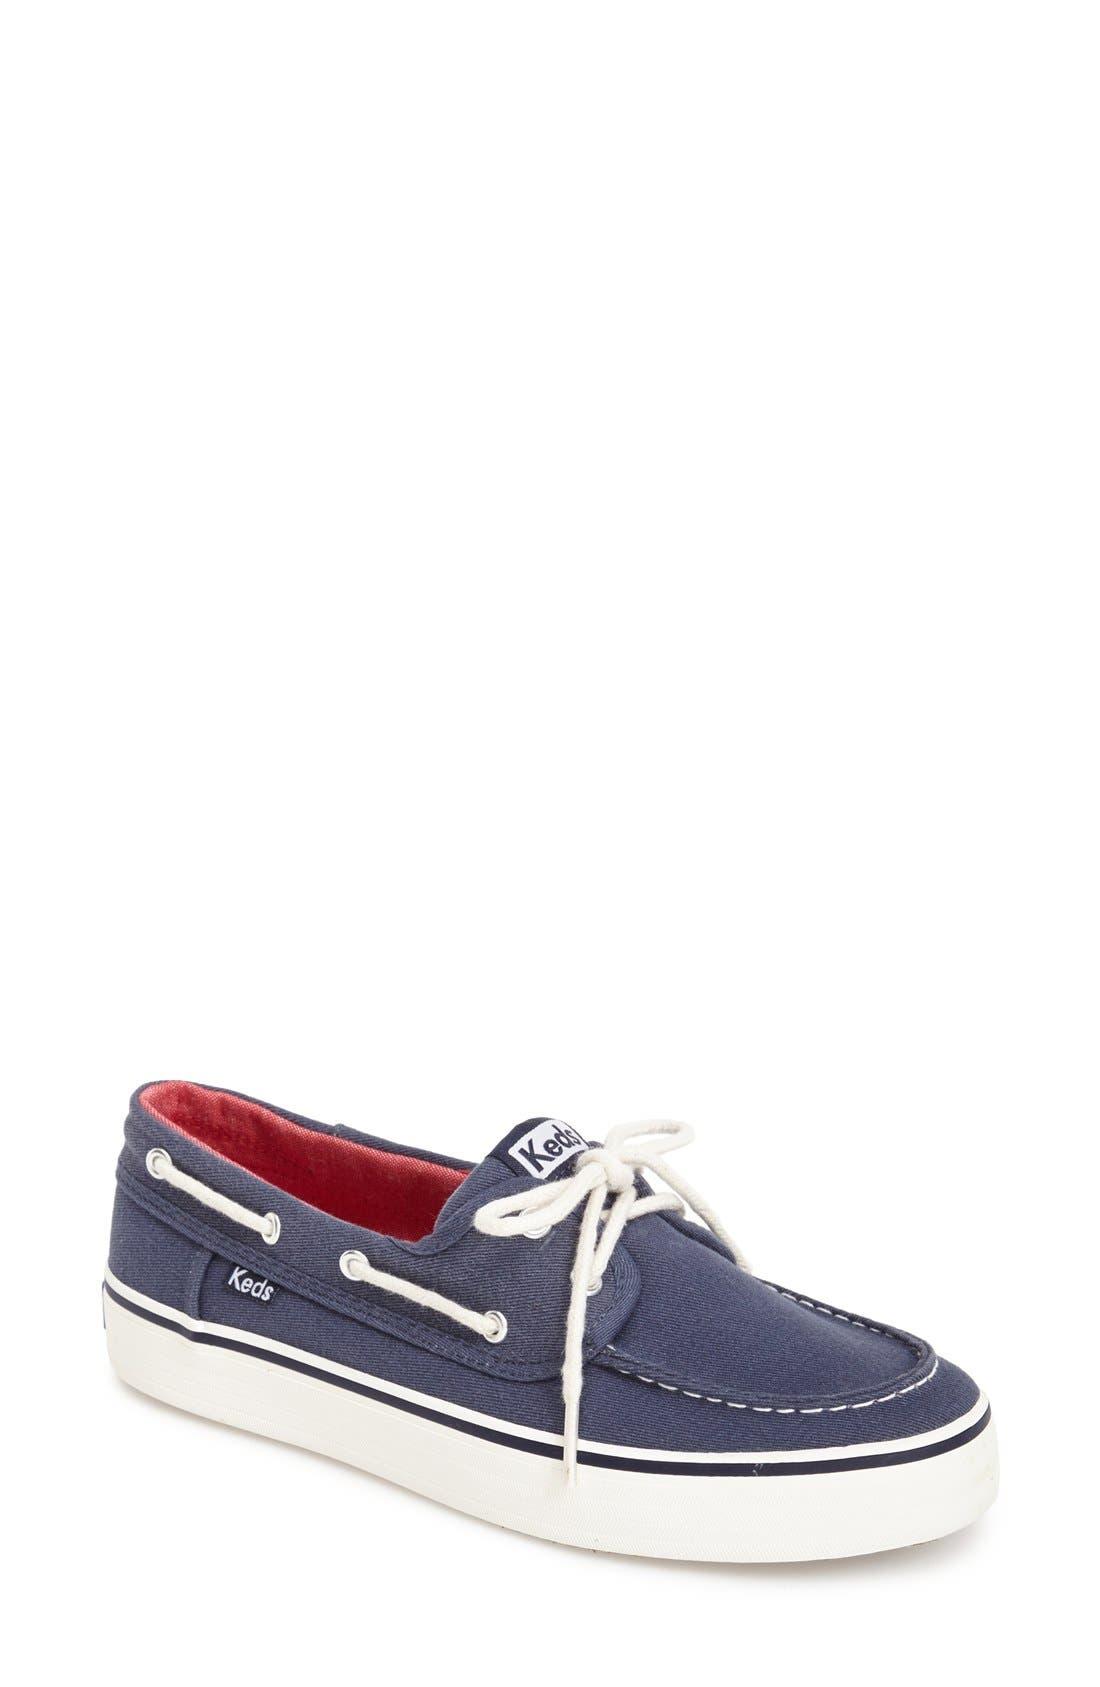 Alternate Image 1 Selected - Keds® 'Bay Bird' Boat Shoe Sneaker (Women)